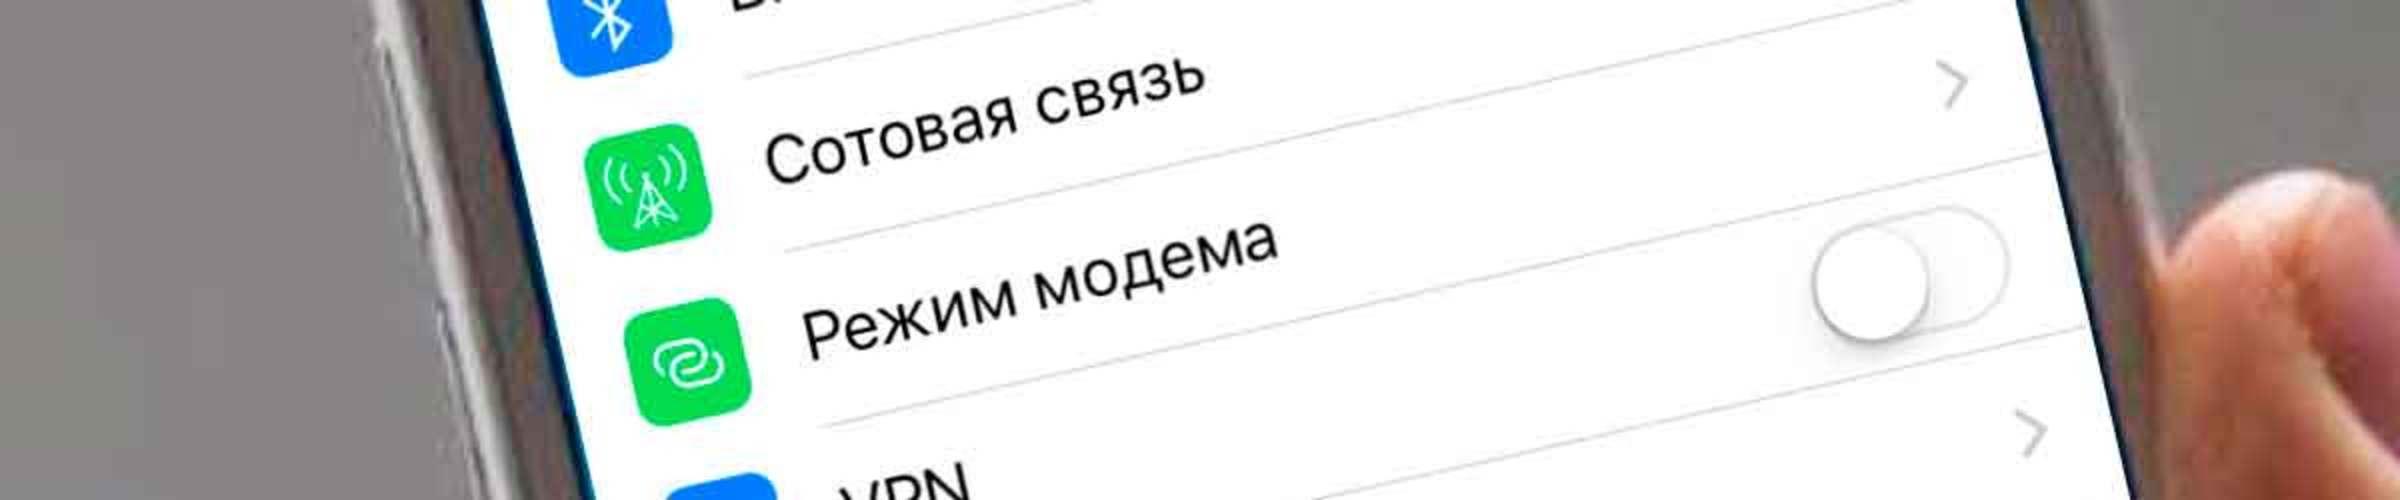 Как включить режим модема на iPhone 7?